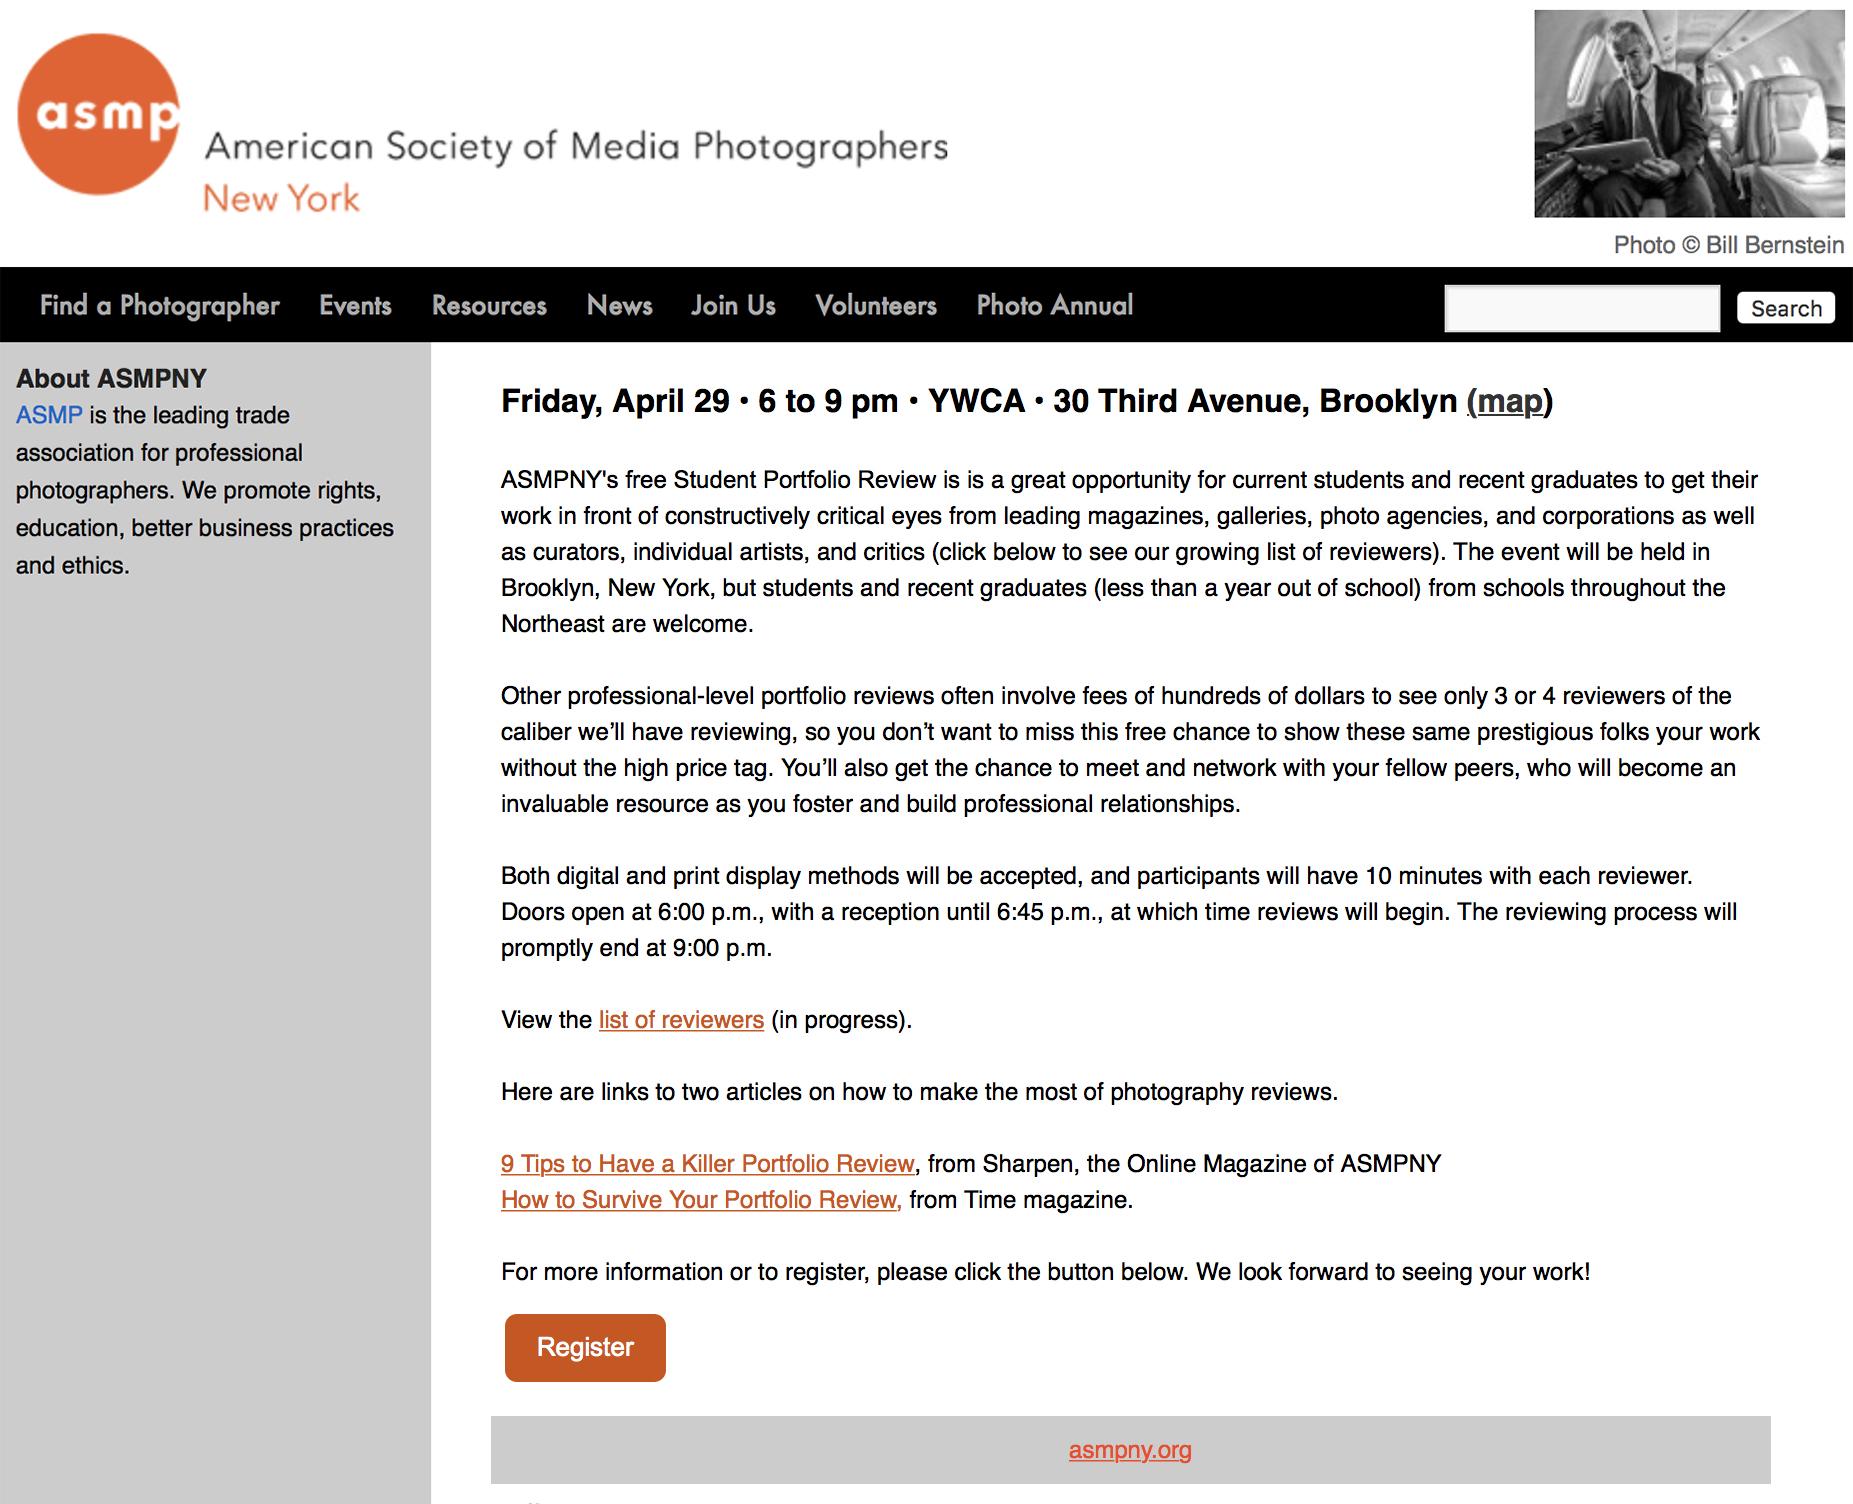 PORTFOLIO REVIEWERASMPNY StudentPortfolio Review NYC - APRIL 29, 2016, 6-9pm Amy reviews student portfolios at ASMP New York's Student Portfolio Review event.